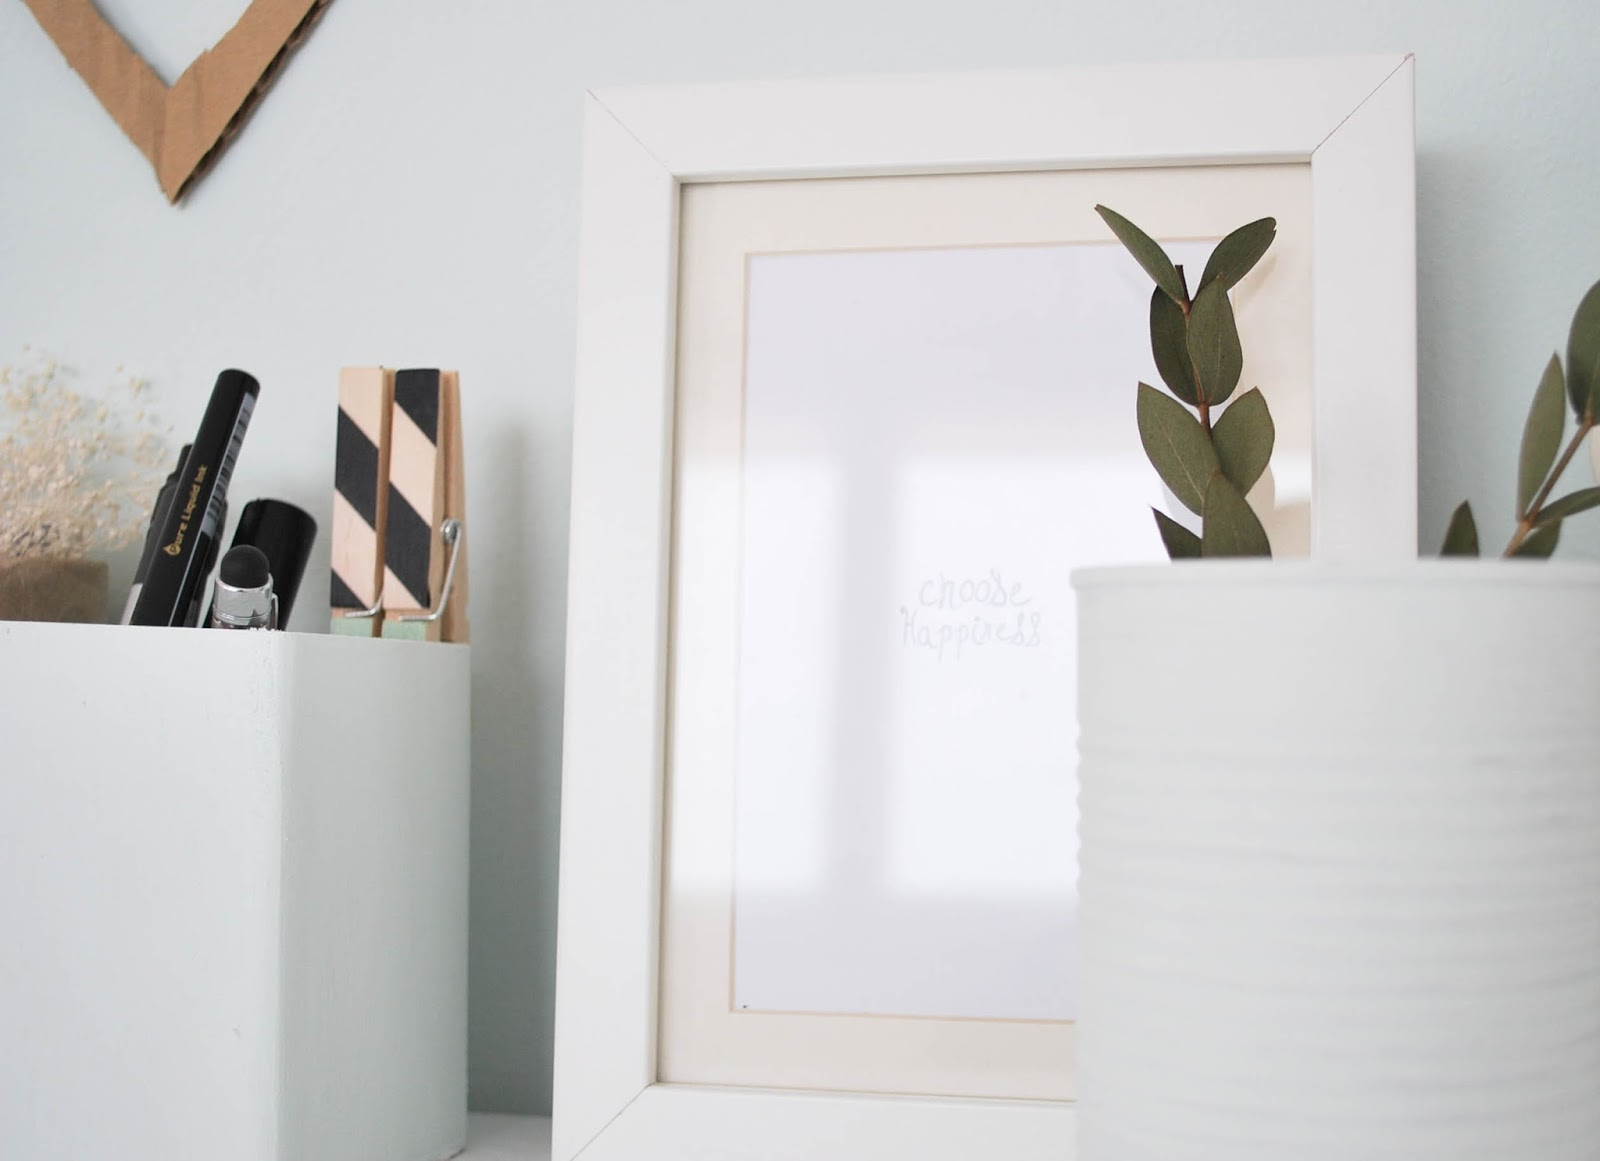 http://www.hommum.com/2014/05/my-home-mi-taller-nordico-paso-a-paso-ii.html taller estilo nórdico #scandinavianstyle